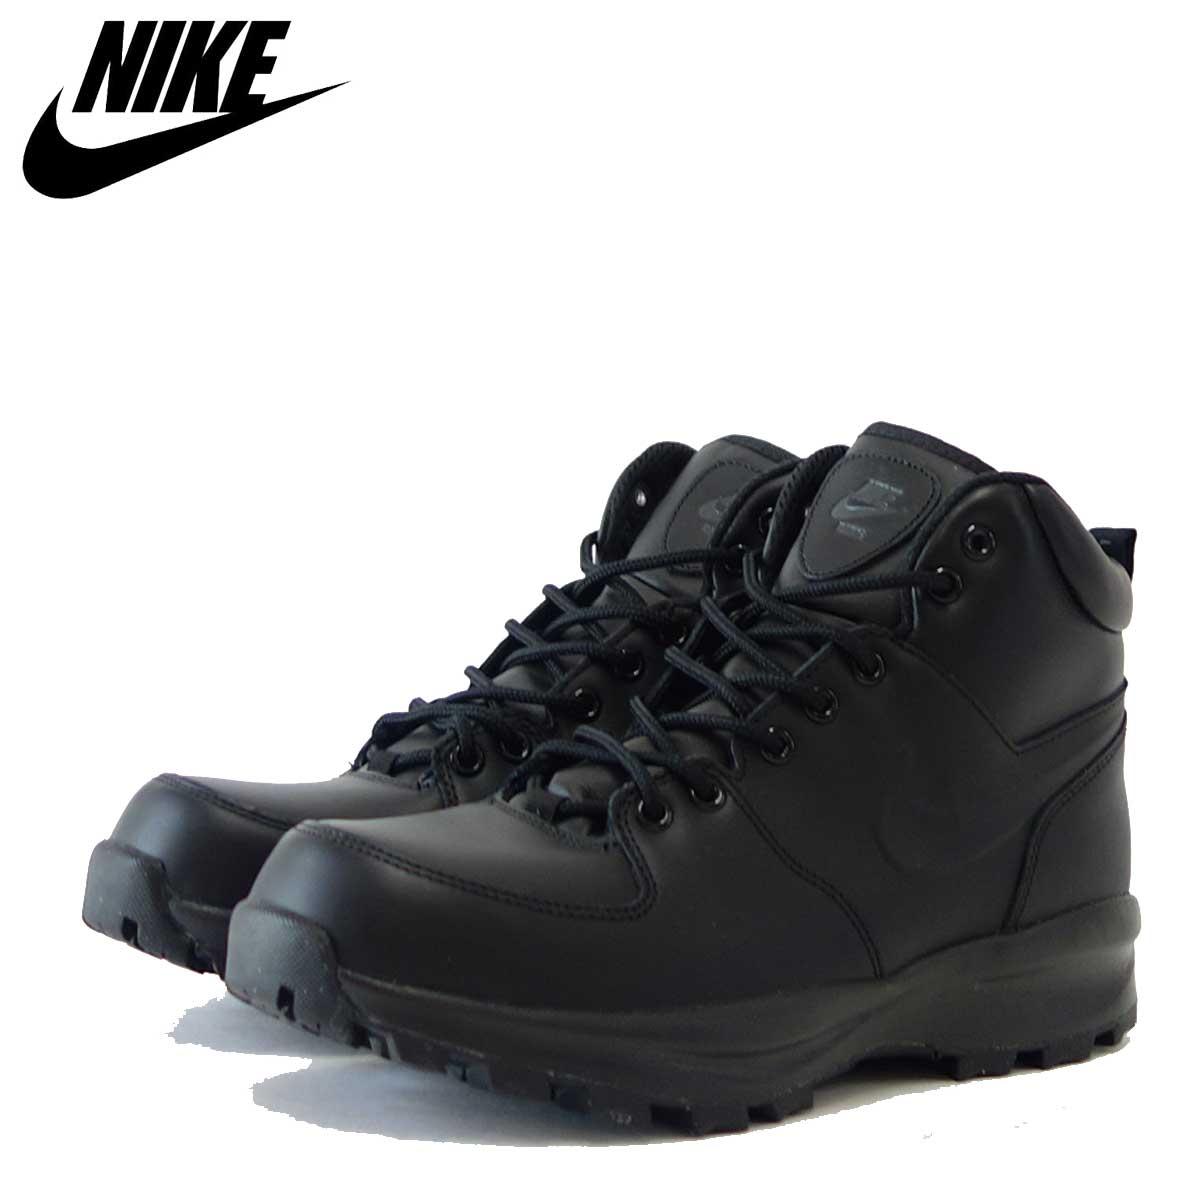 NIKE ナイキ マノアレザー 454350 003 ブラック(メンズ) NIKE MANOA LEATHER 「靴」